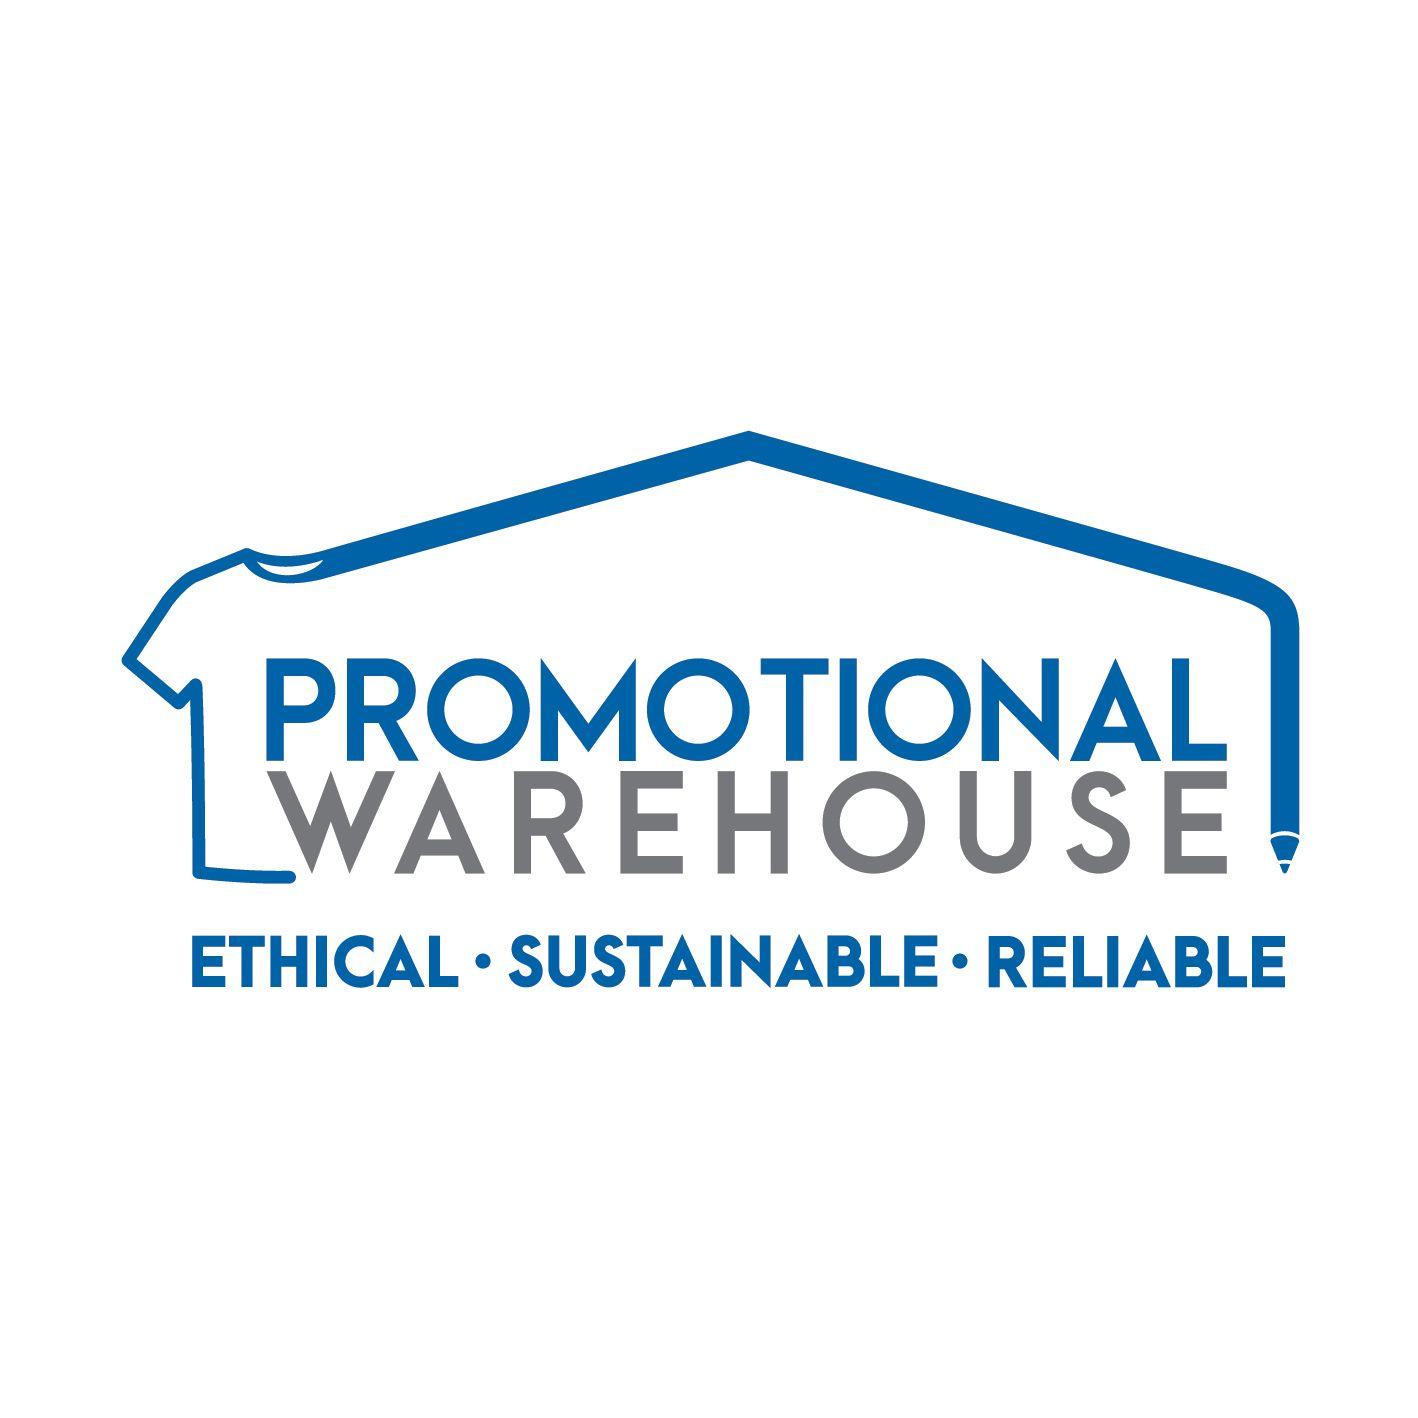 Promotional Warehouse